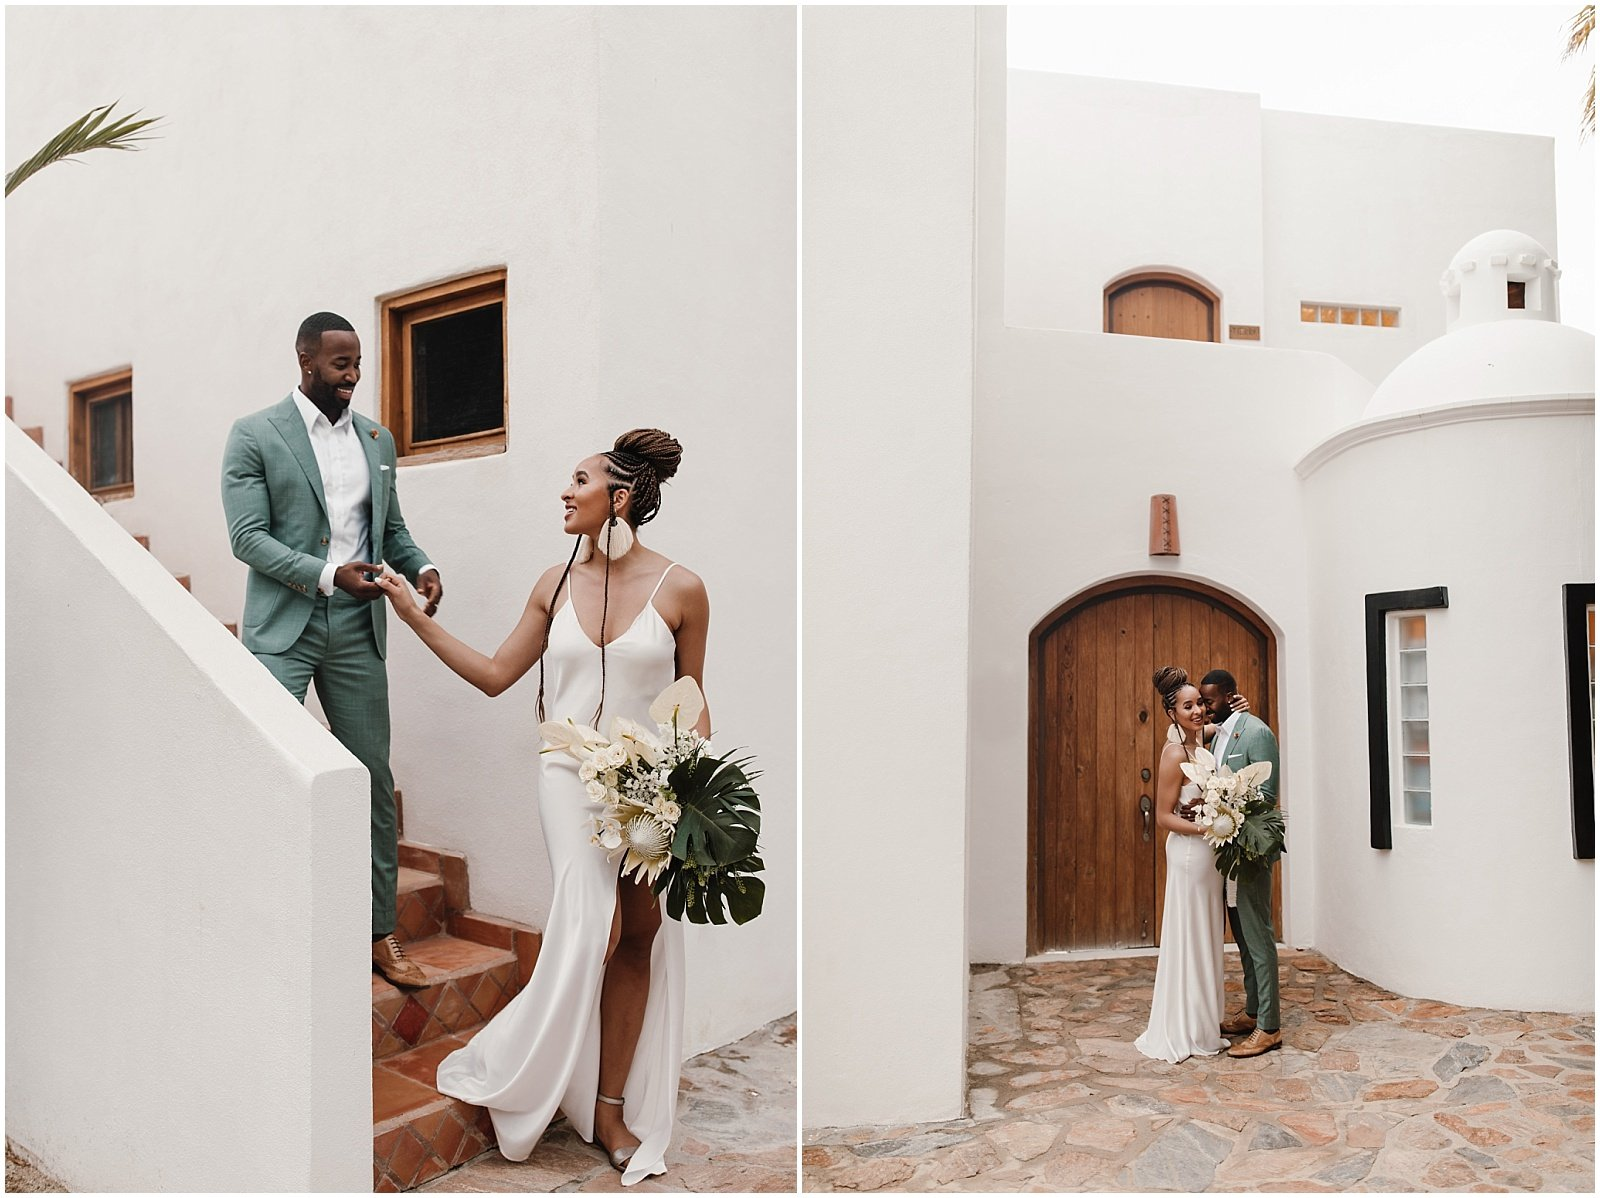 Bride and groom at Pachamama Resort in Todos Santos, Mexico